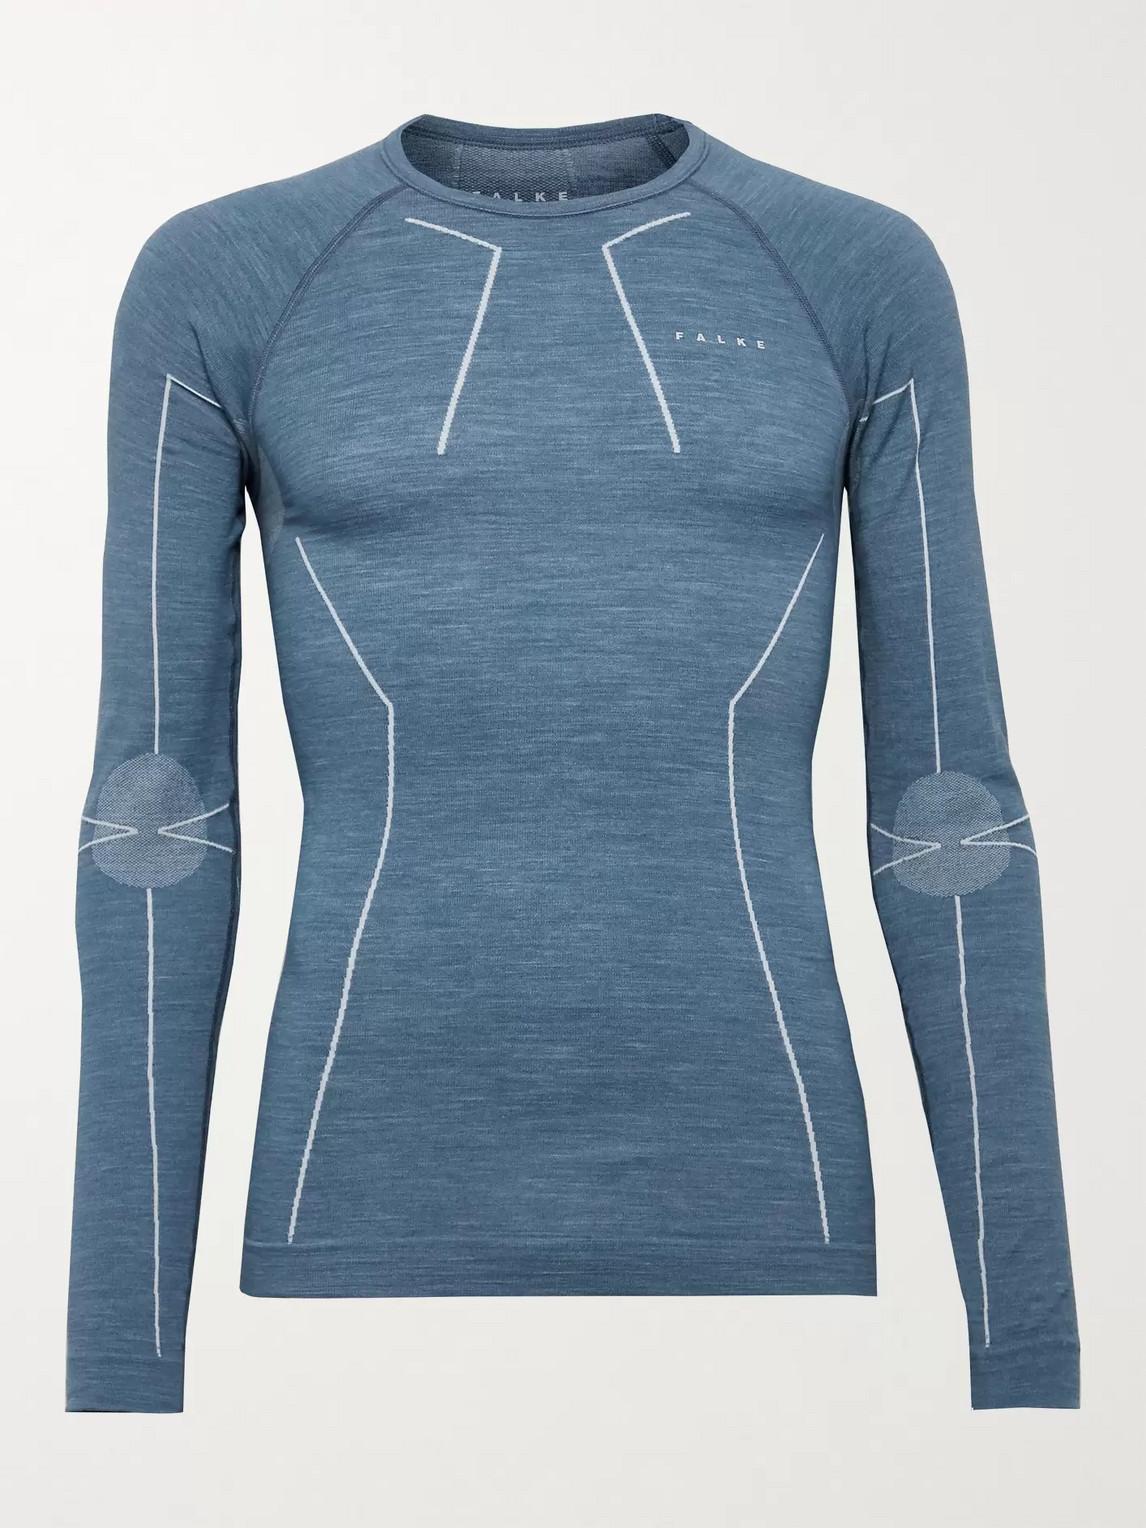 falke ergonomic sport system - stretch virgin wool-blend ski base layer - men - blue